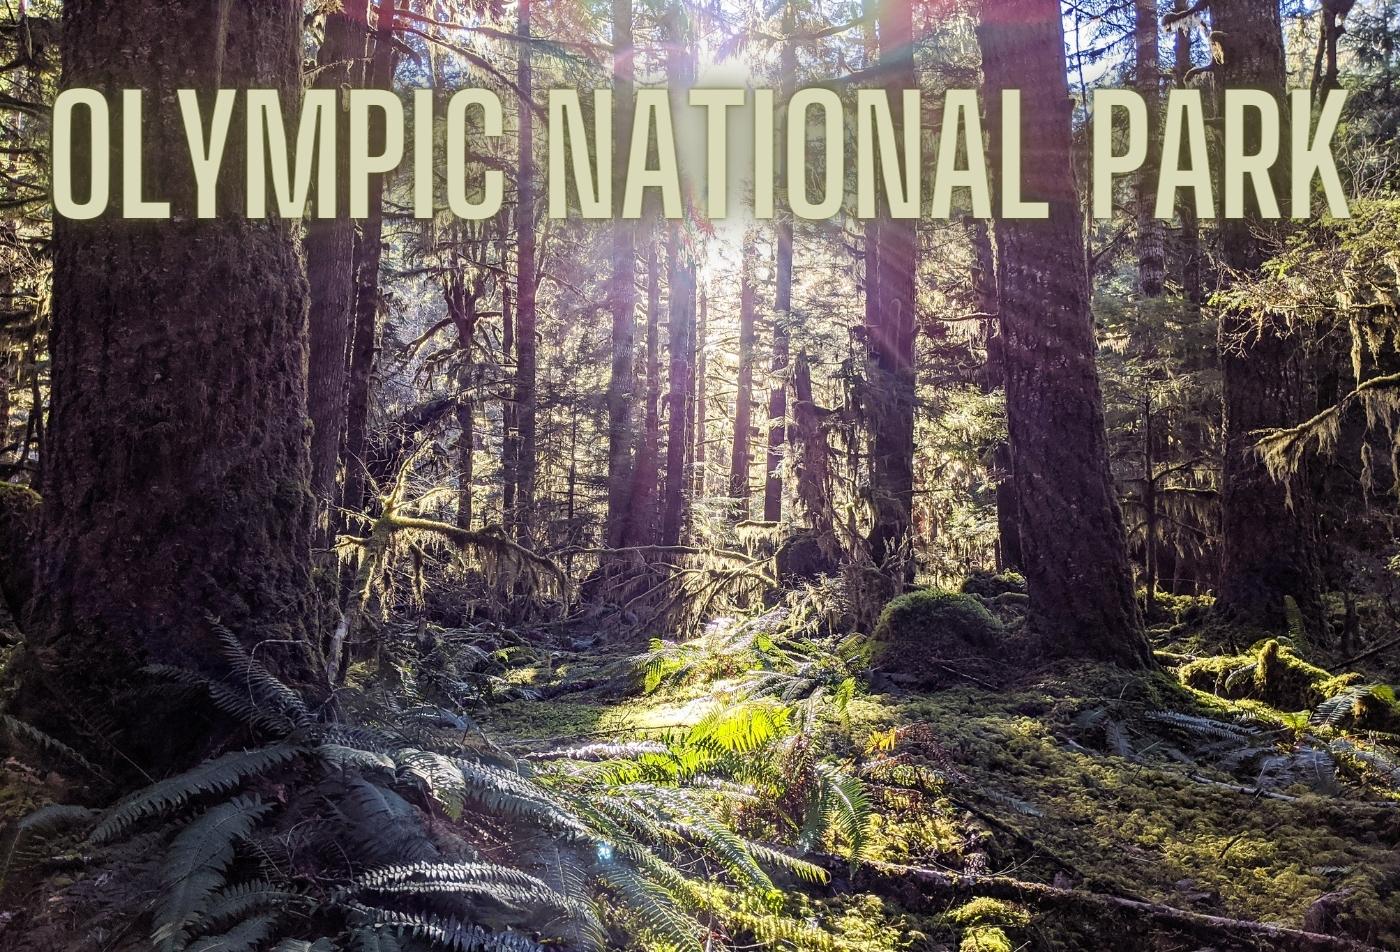 A Walk Through Olympic National Park